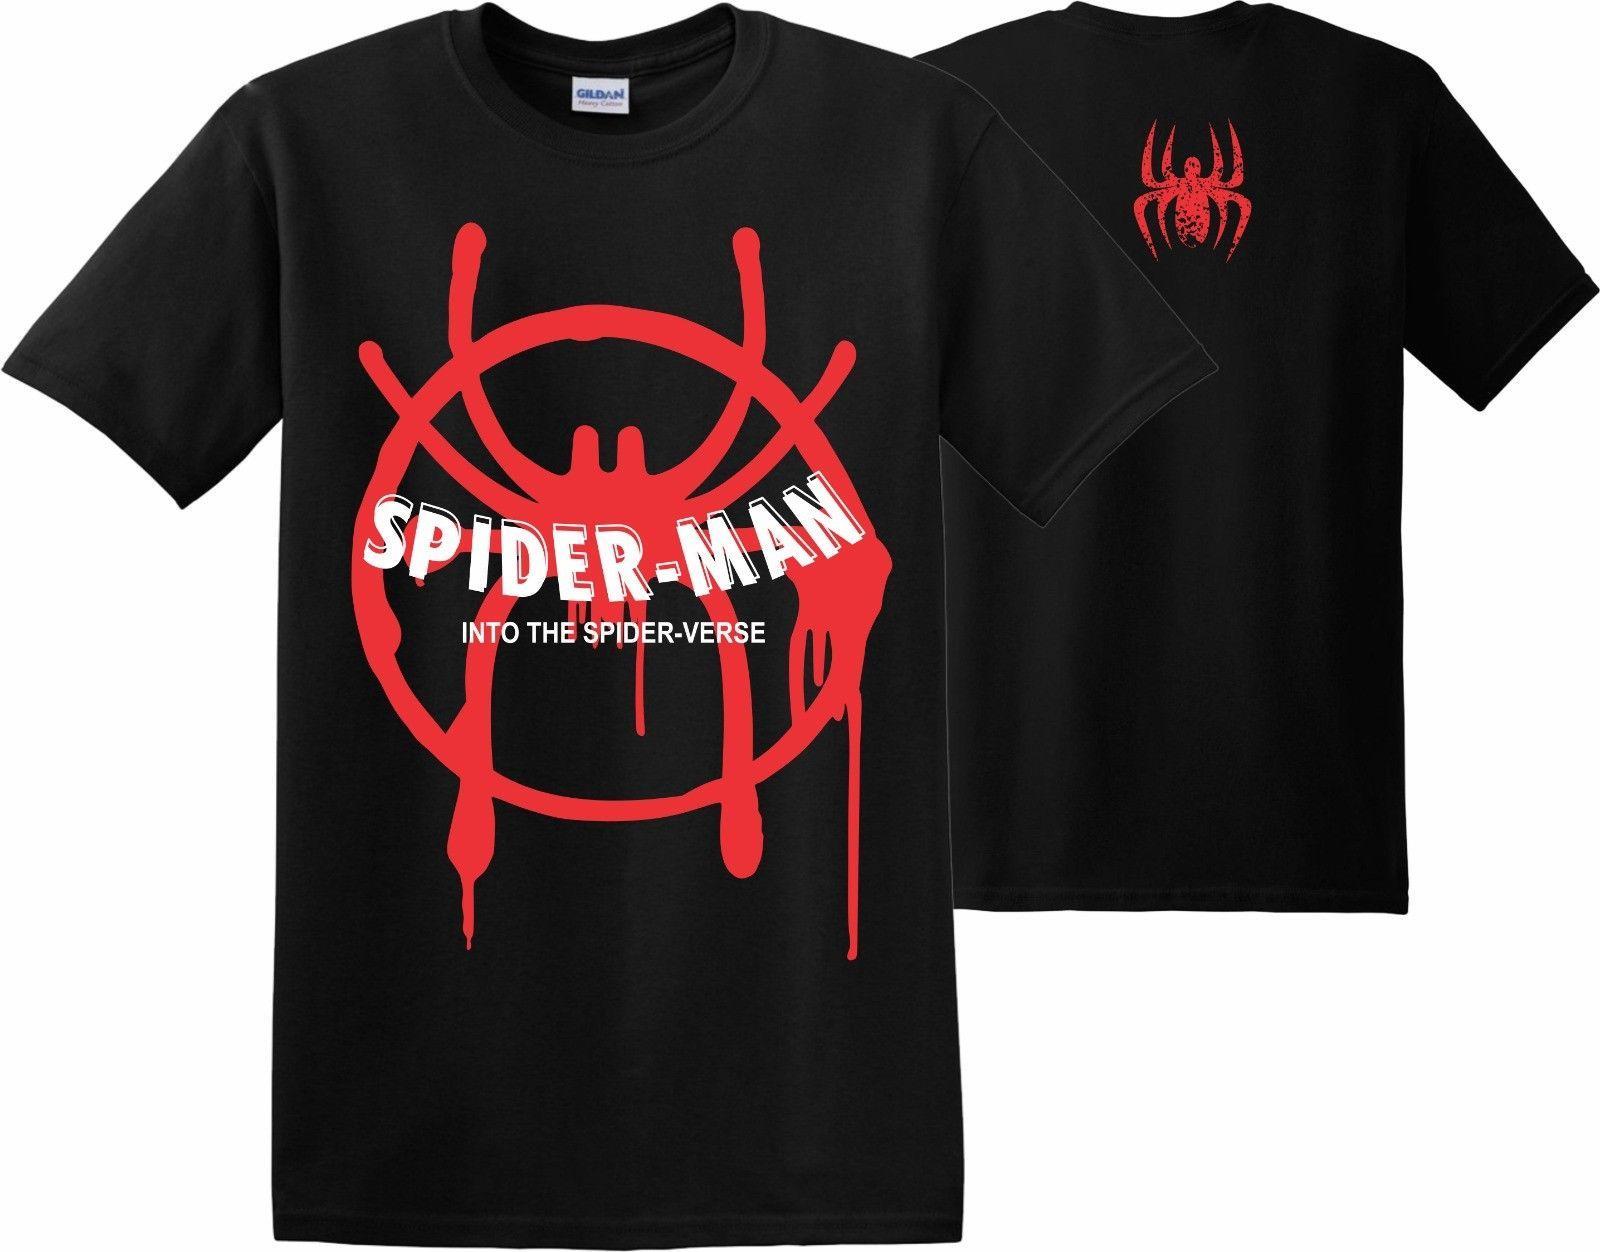 0d3dacf24 Spider Man Into the Spider Verse T-Shirt Marvel Christmas Xmas Venom Men's  Kids Custom t shirt logo text photo Mens Womens T-shirt men